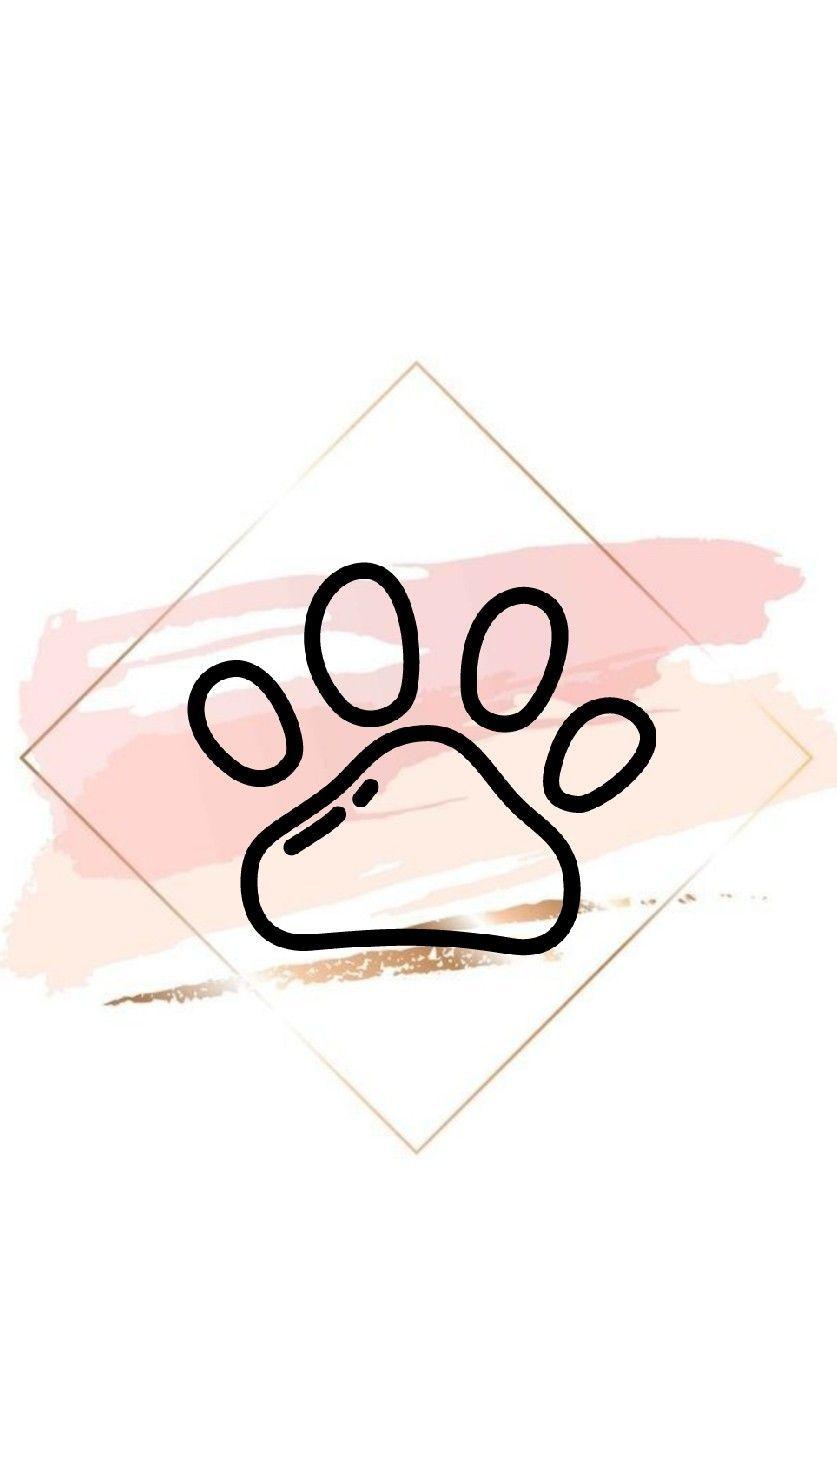 486c3591 Hd Wallpaper Instagram Highlight Icons Pink Instagram Instagram Logo